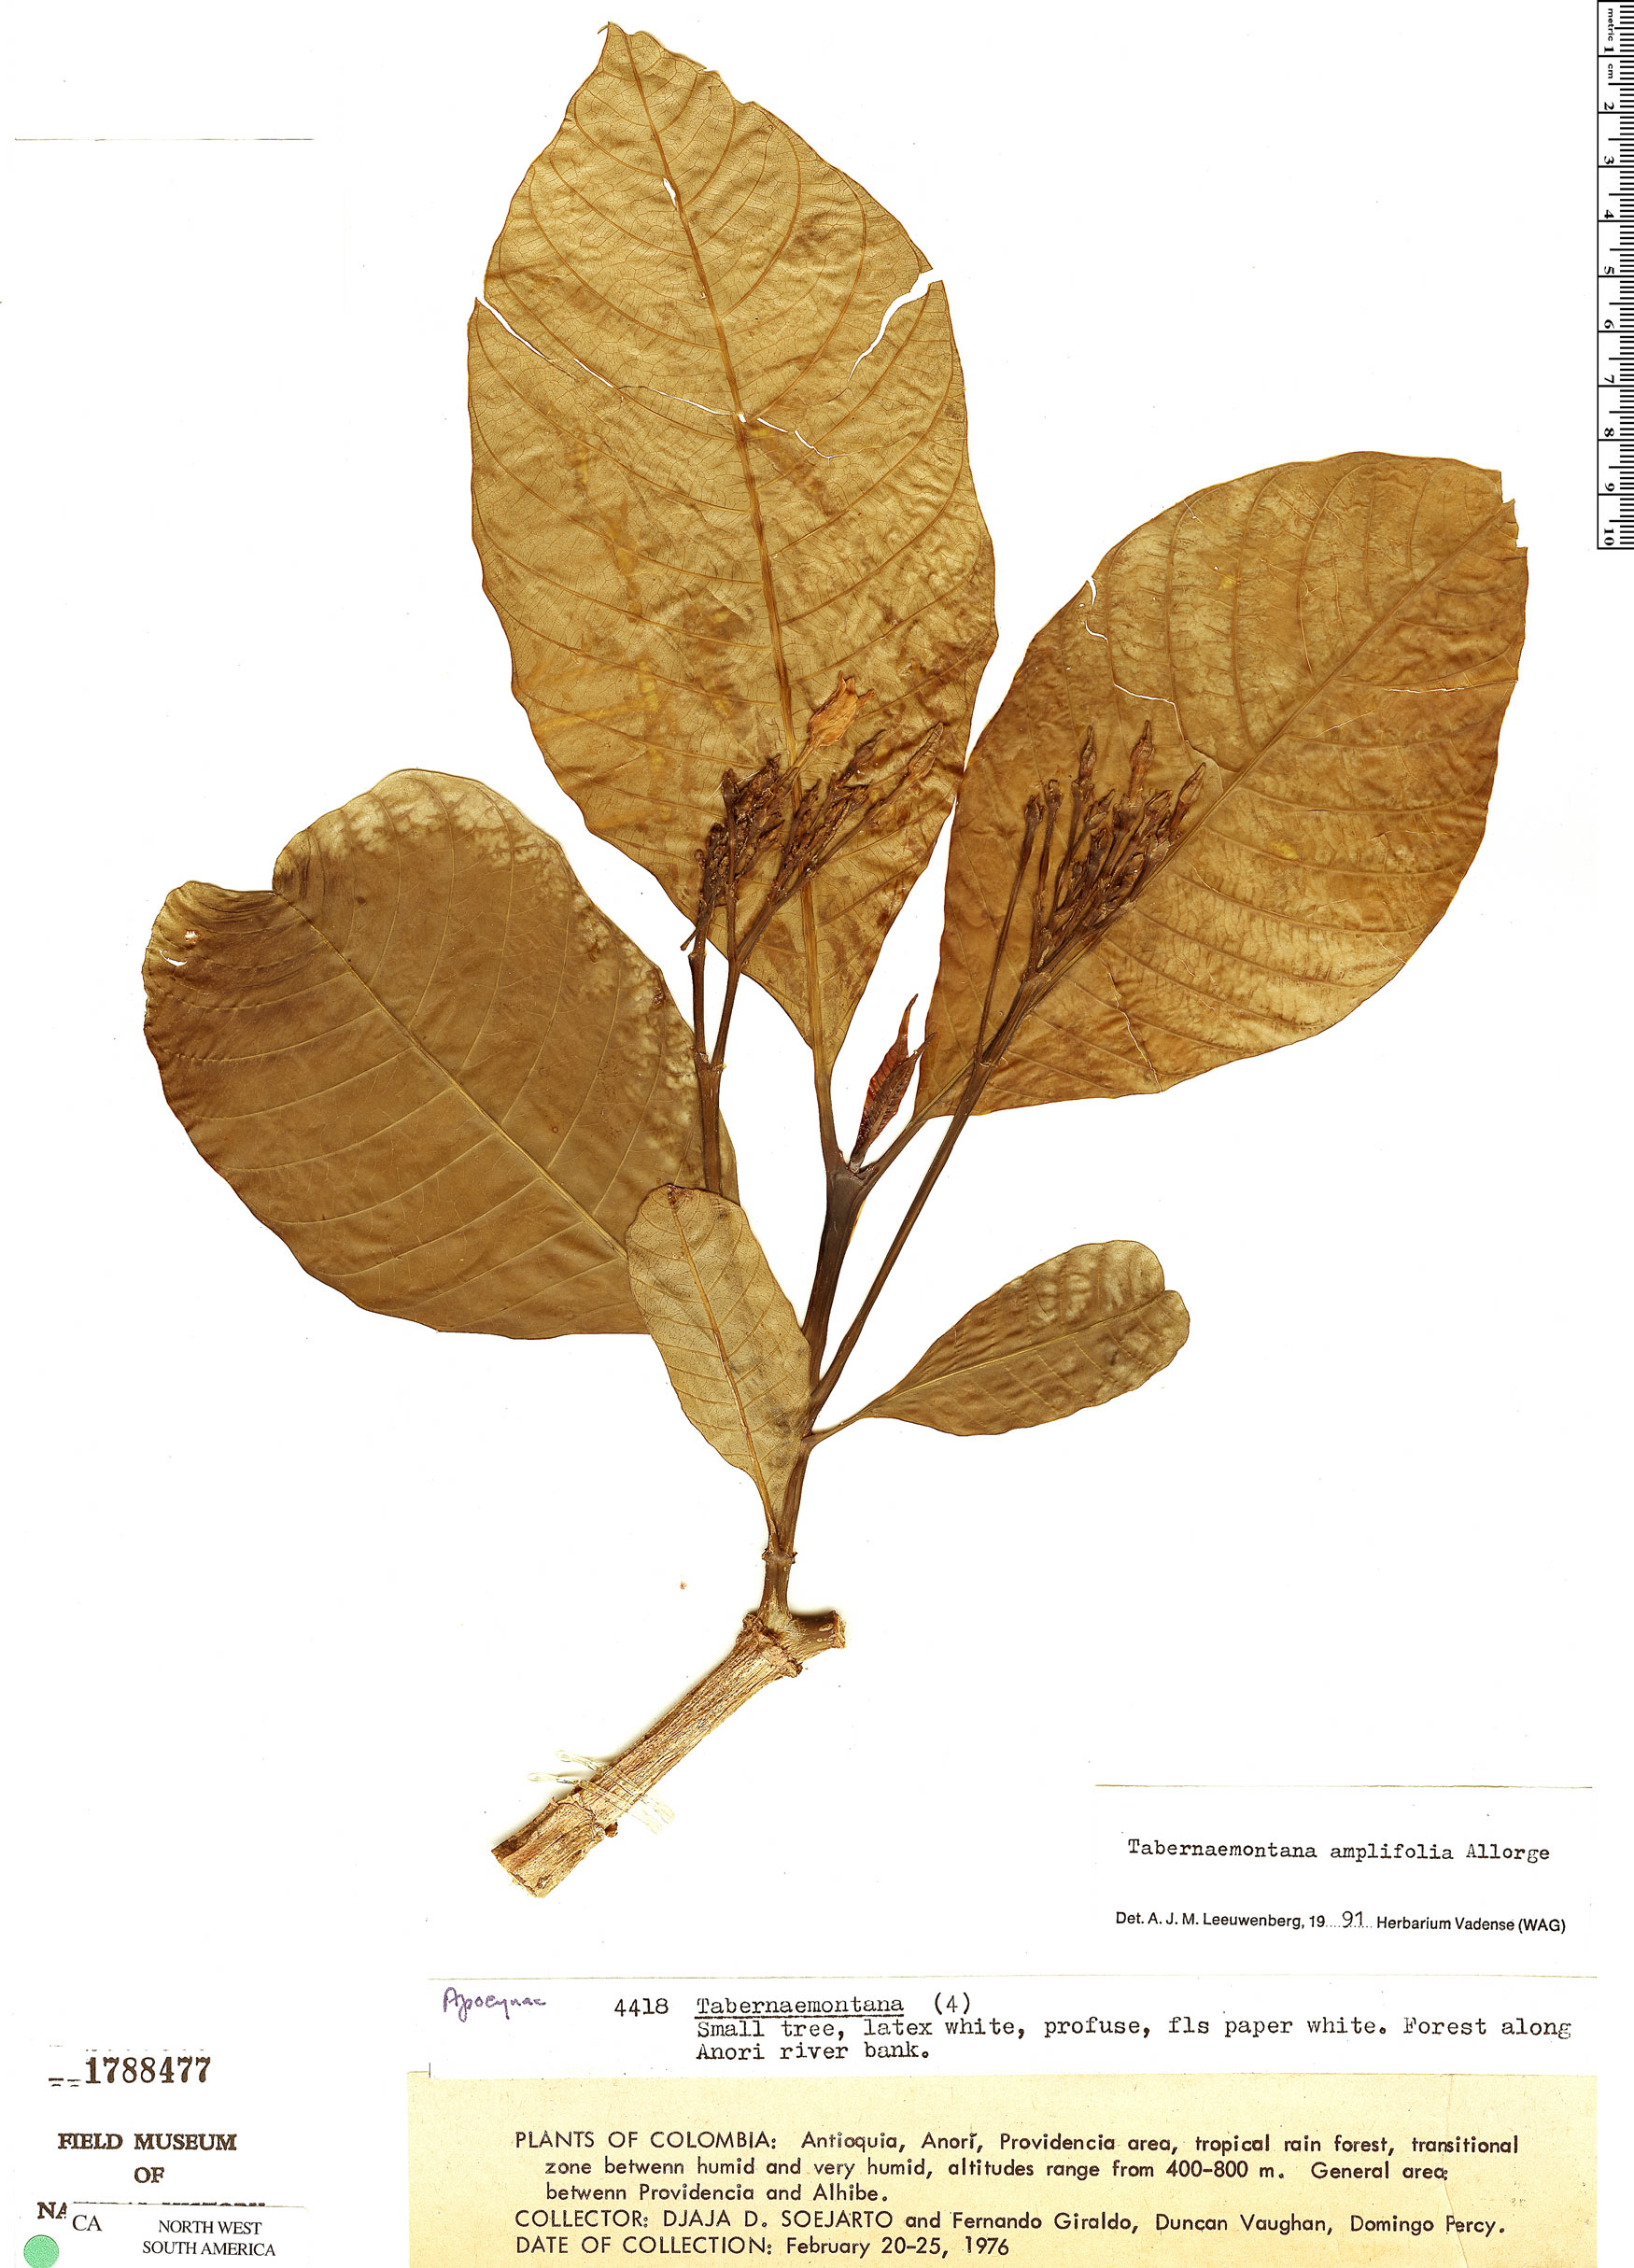 Specimen: Tabernaemontana amplifolia